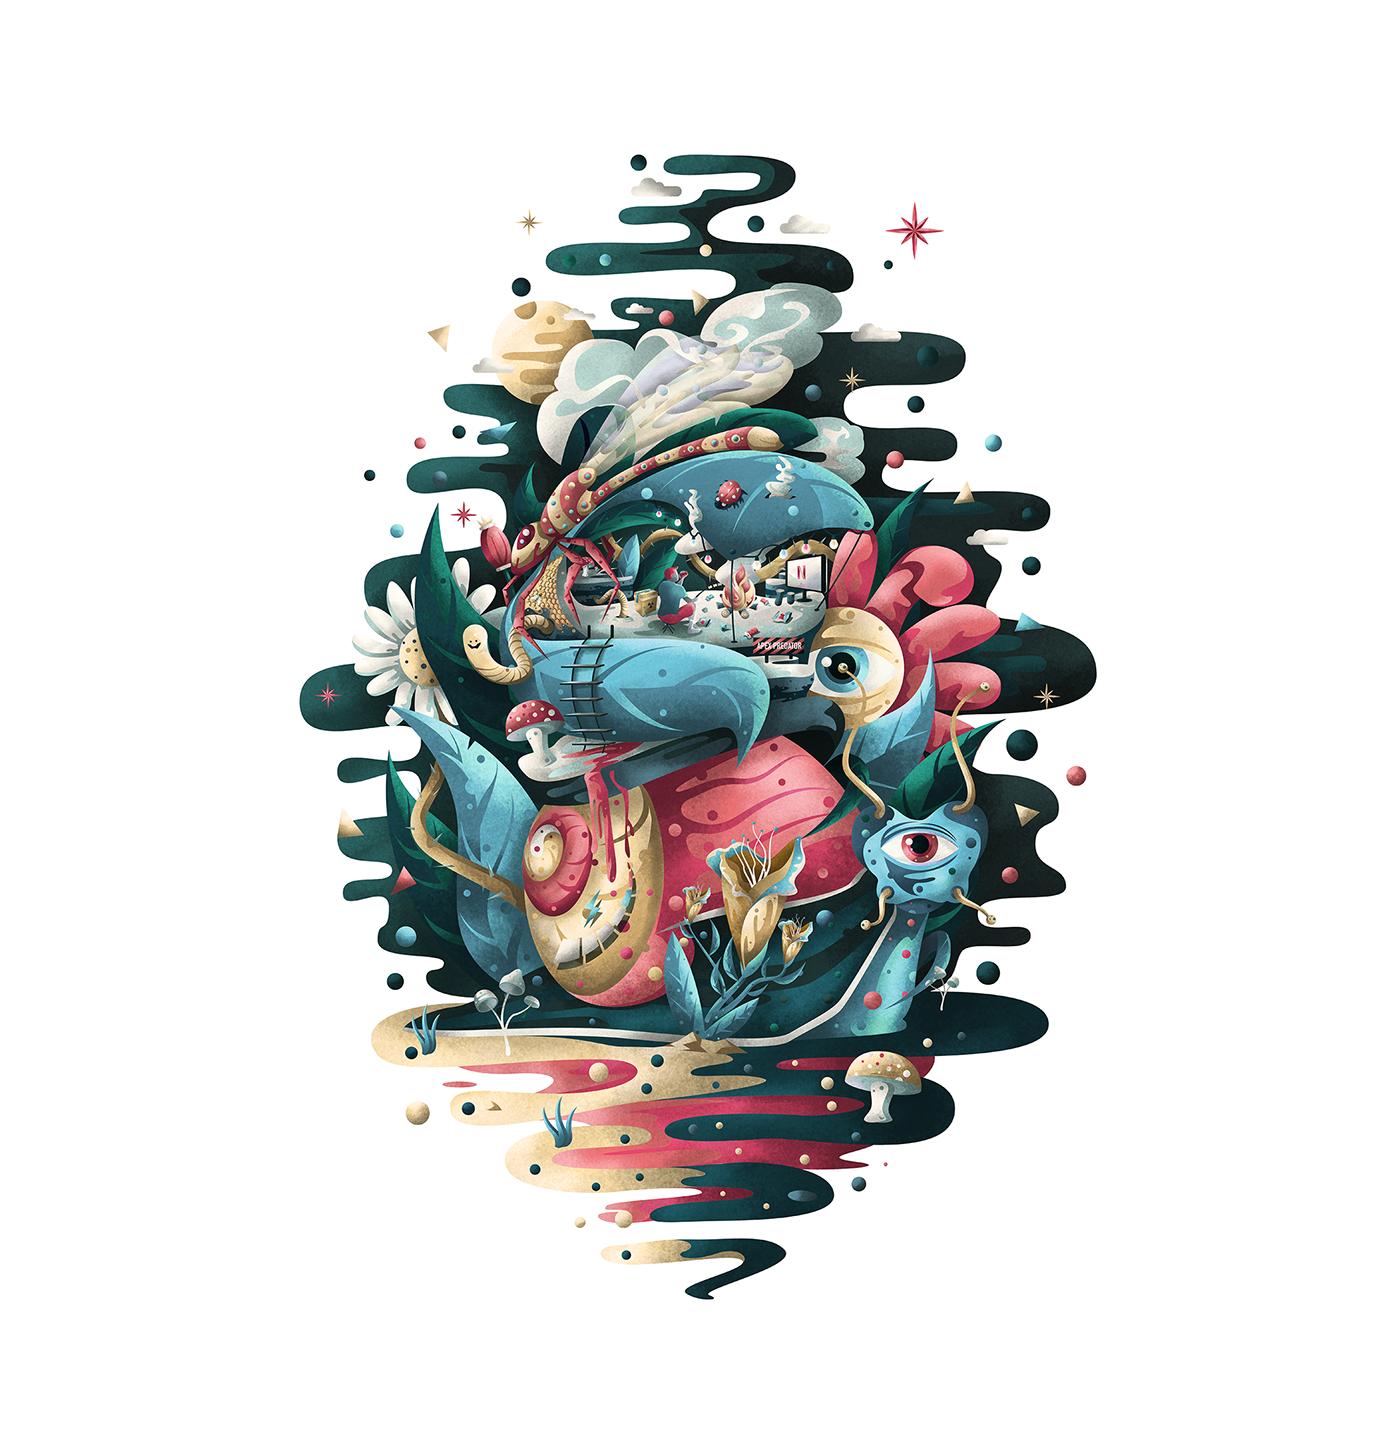 Nature animals Landscape brushes Vectorillustration SKY sea colorful fantasy Drawing